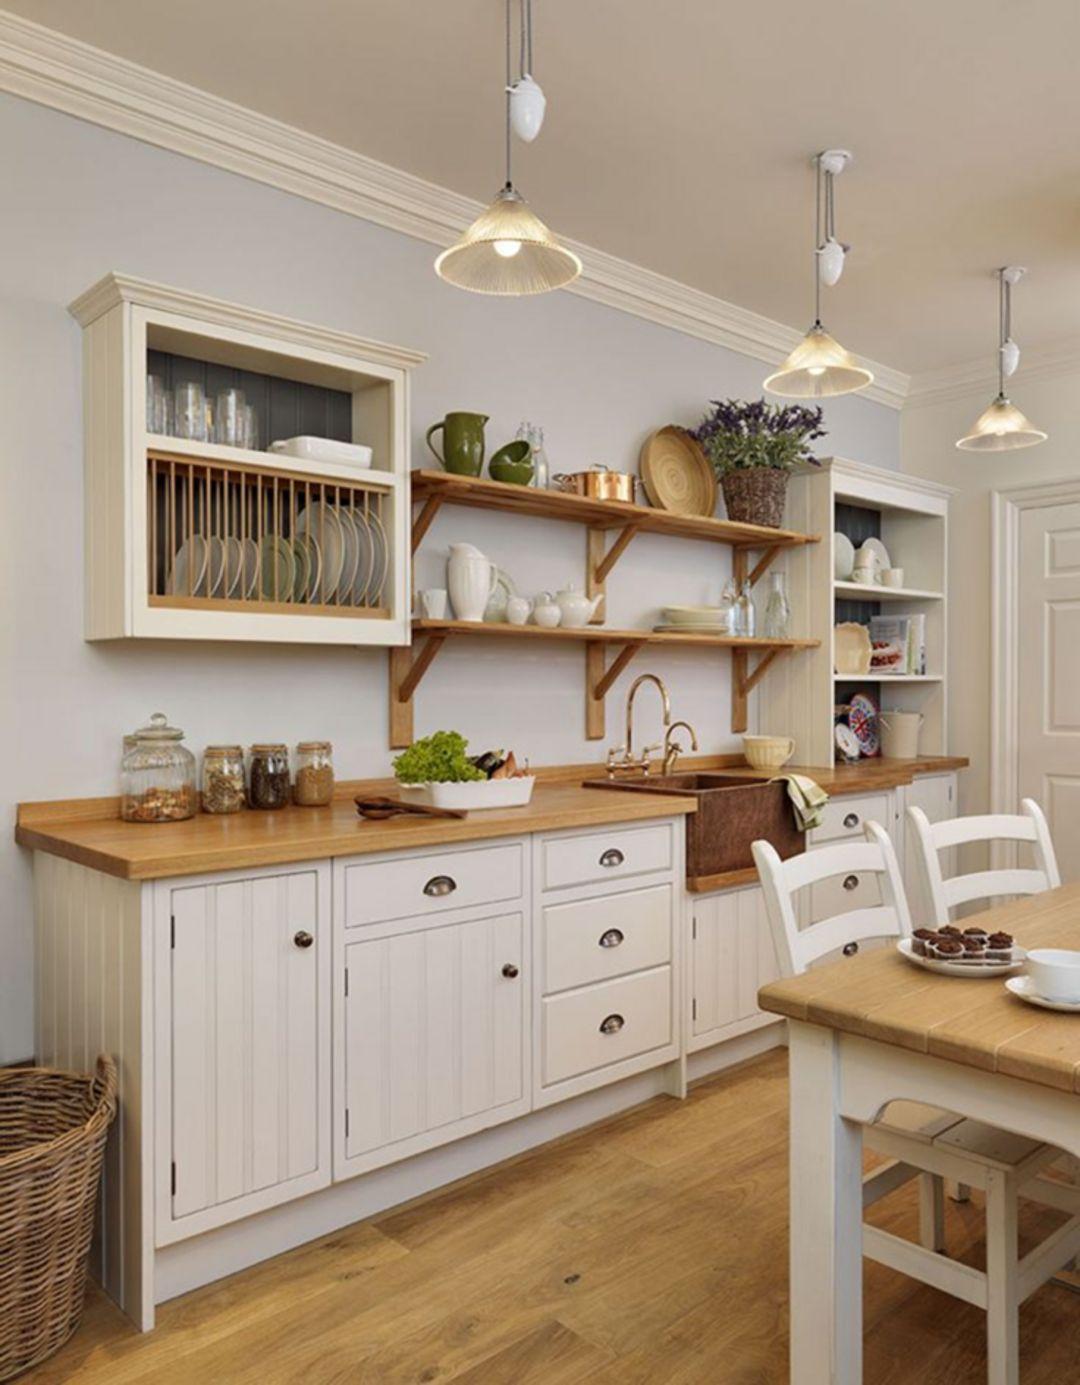 Interesting 25 Minimalist Kitchen Self Design Ideas To Make Your